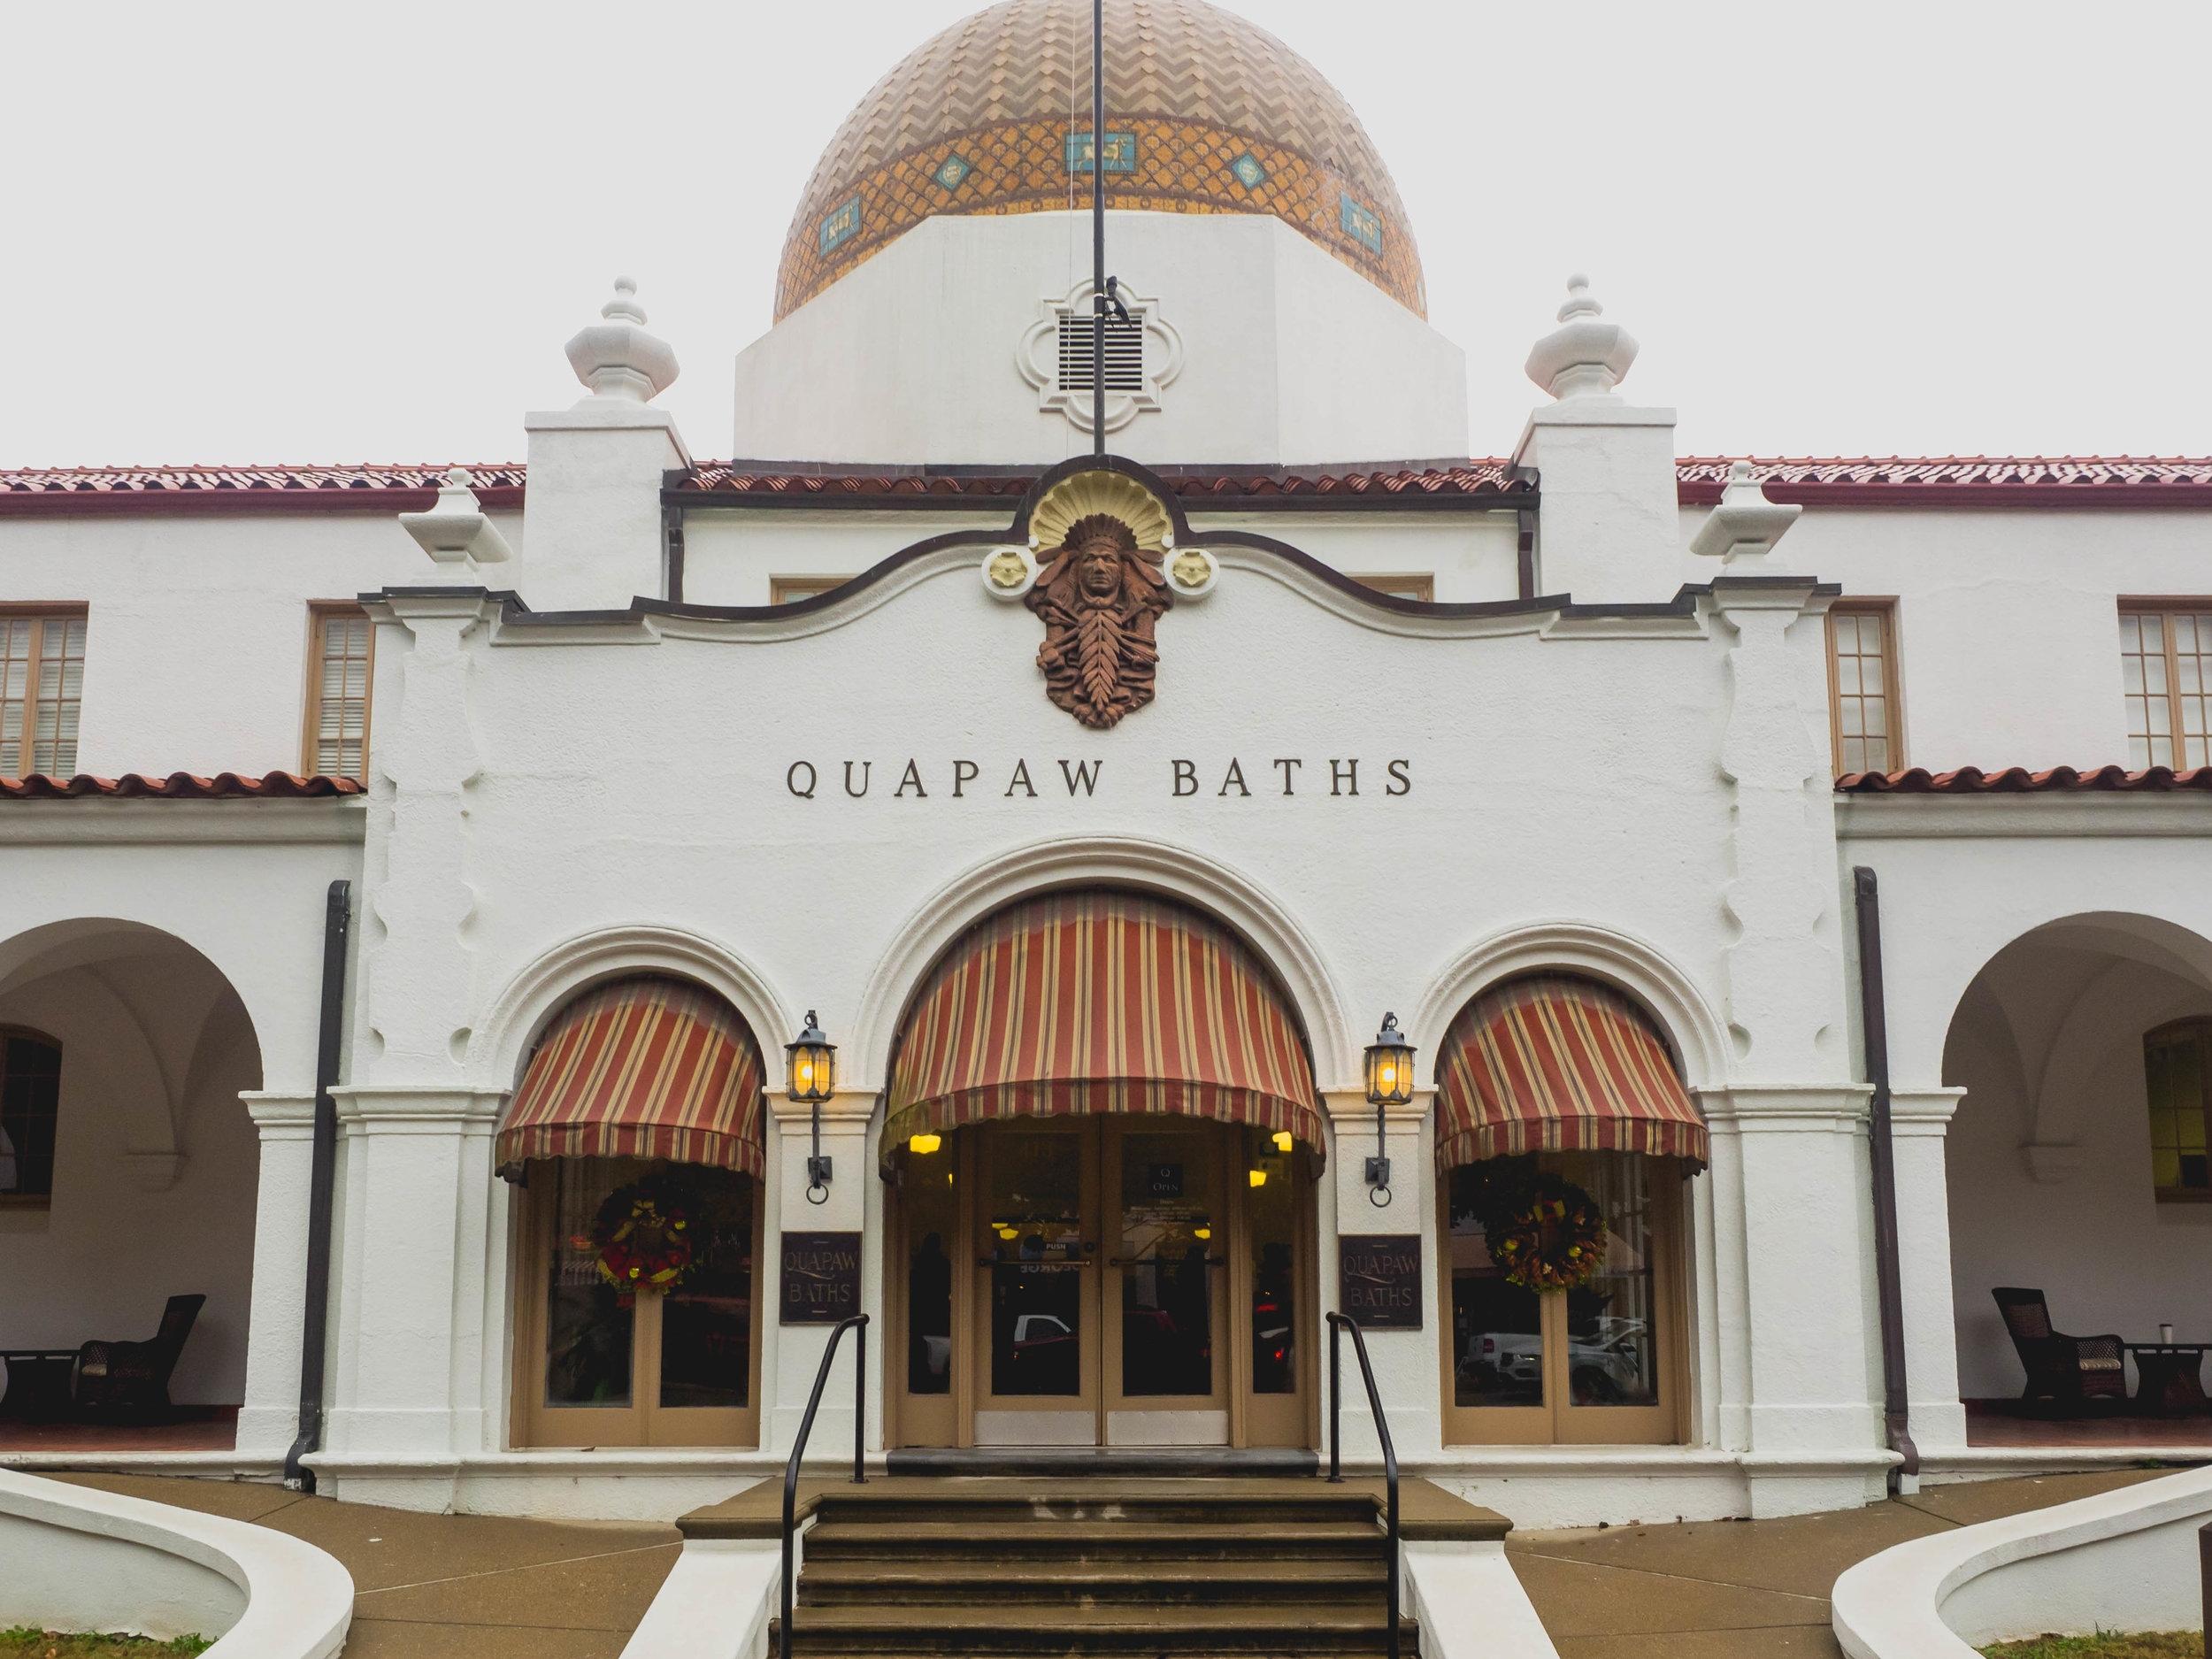 quapaw baths.